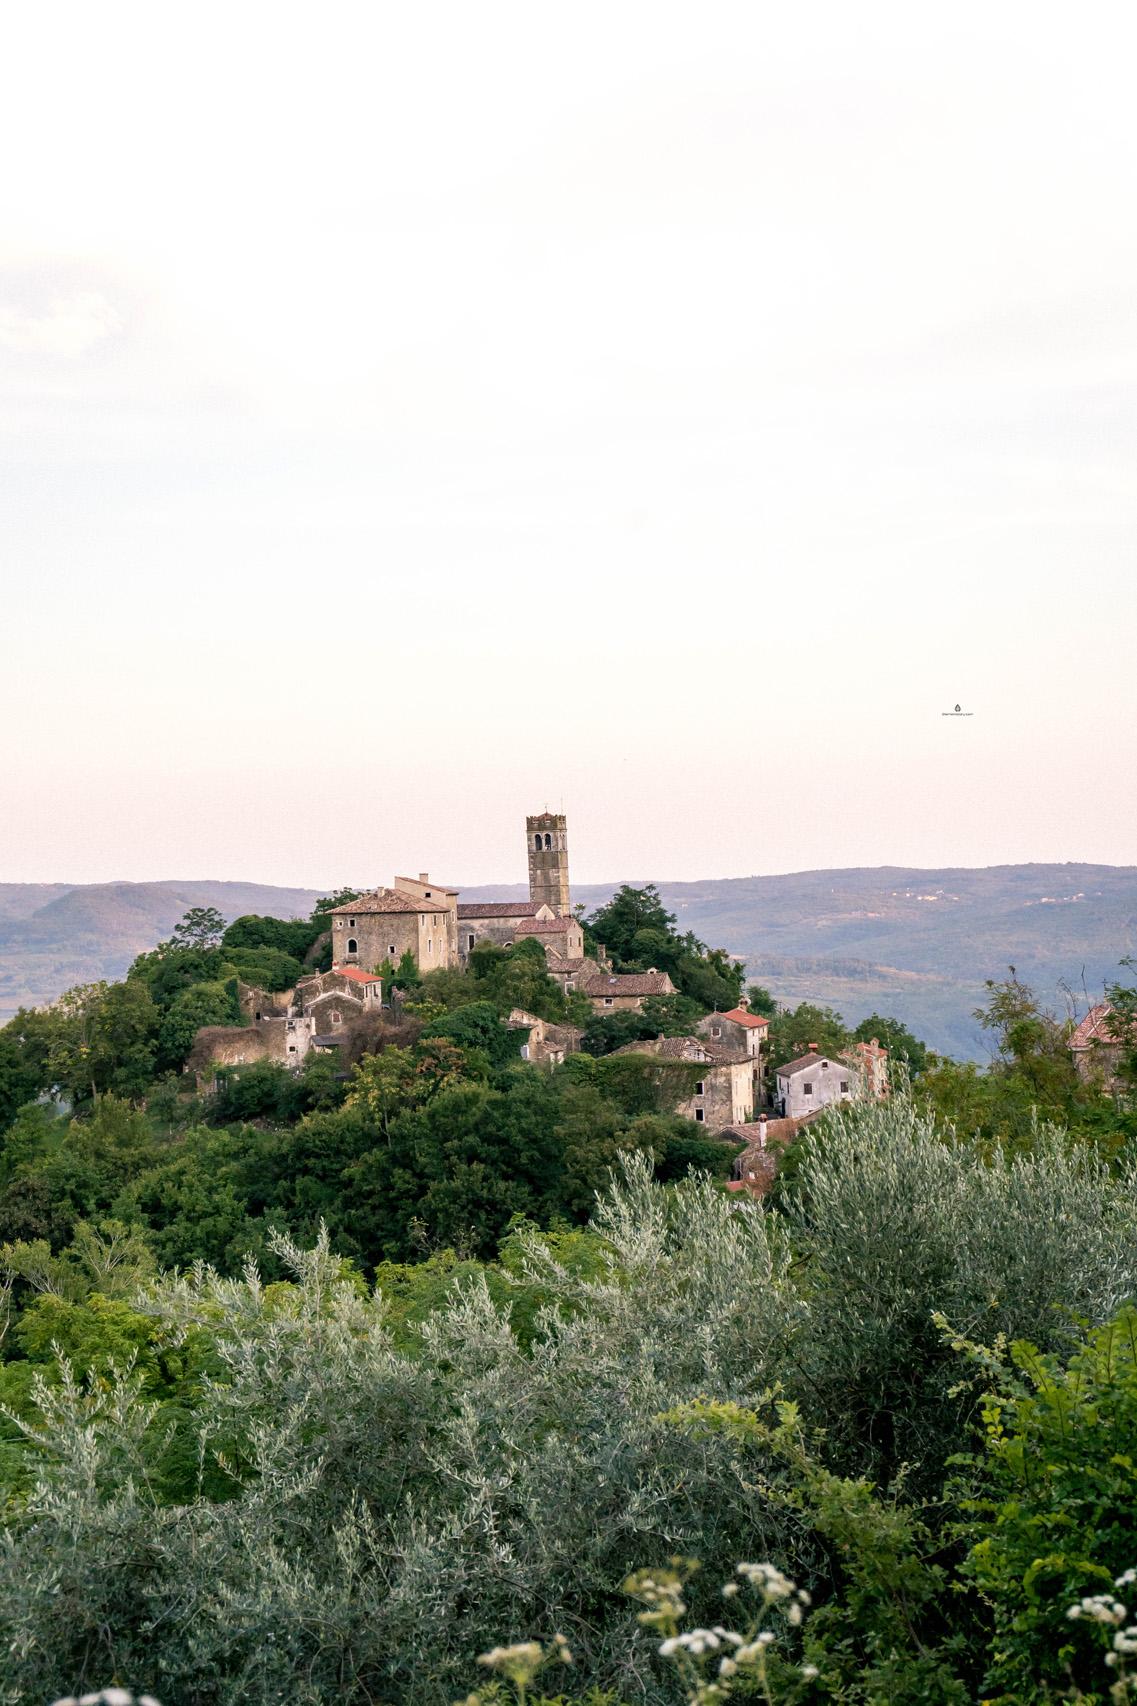 The town of Zavrsje, Istria